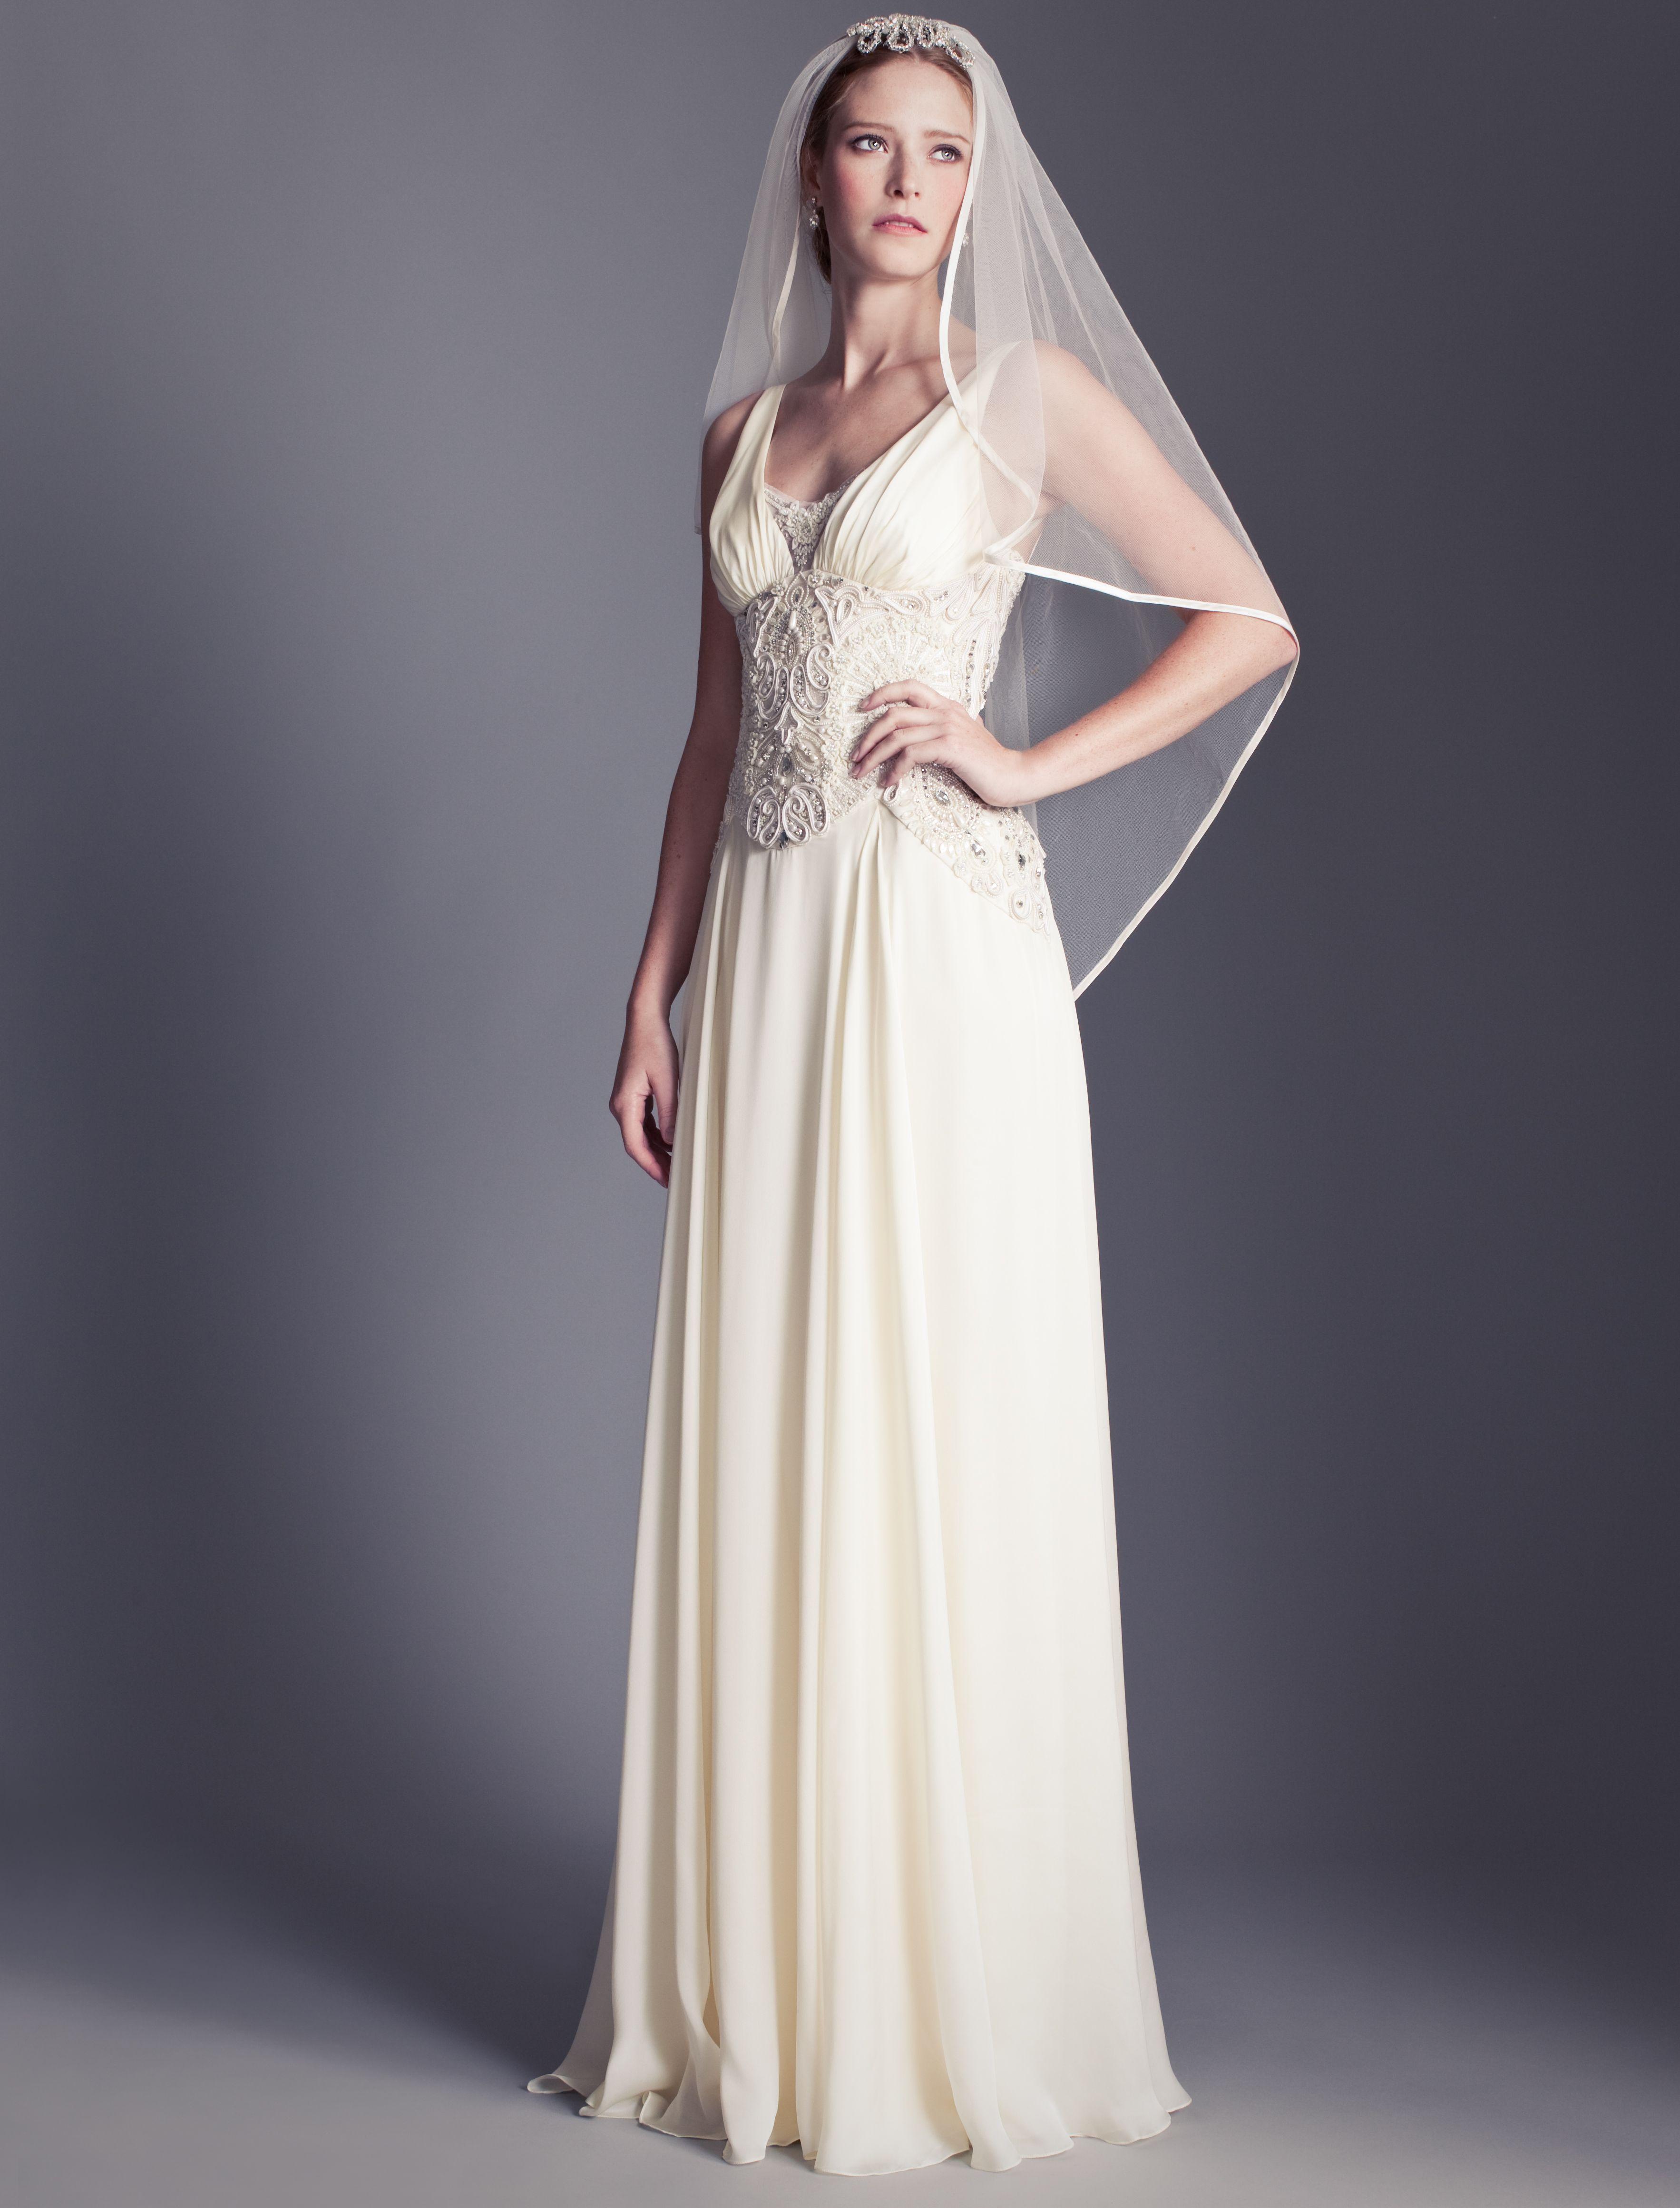 Beatrice Hair Comb Wedding gown gallery, Designer